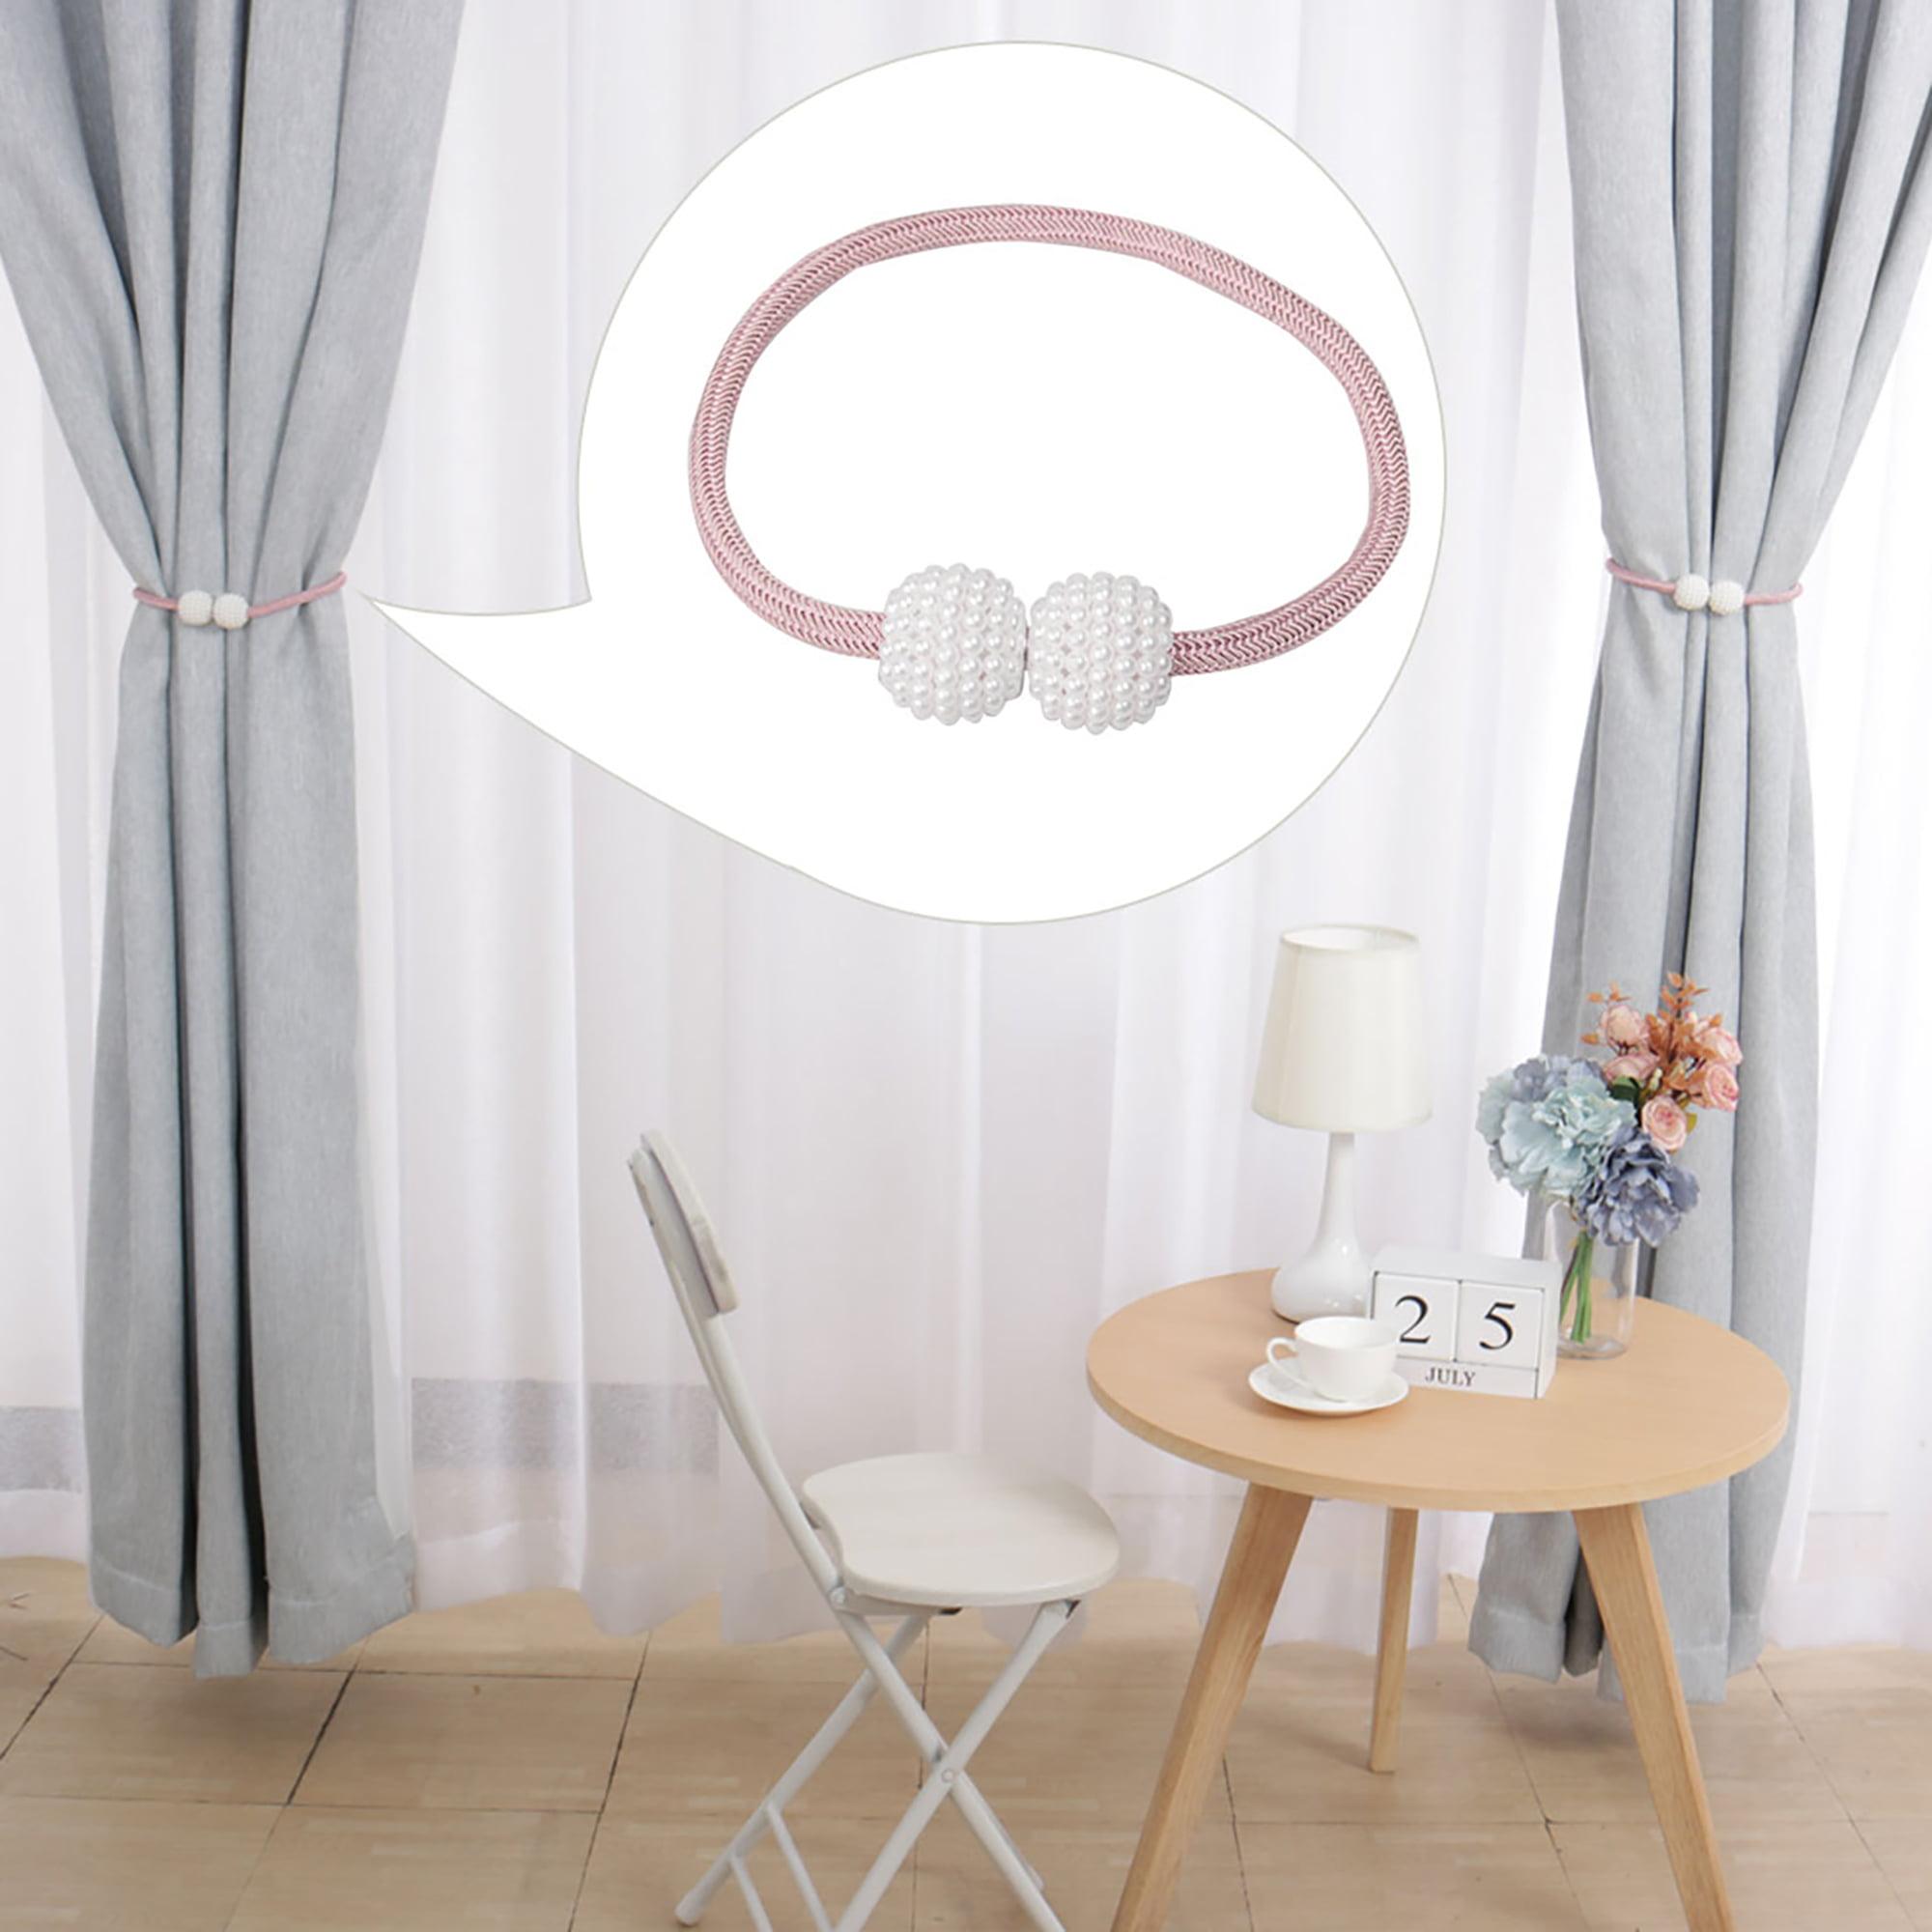 bedroom CHENILLE BRAIDED ROPE TIEBACKS dining curtains lounge PAIR